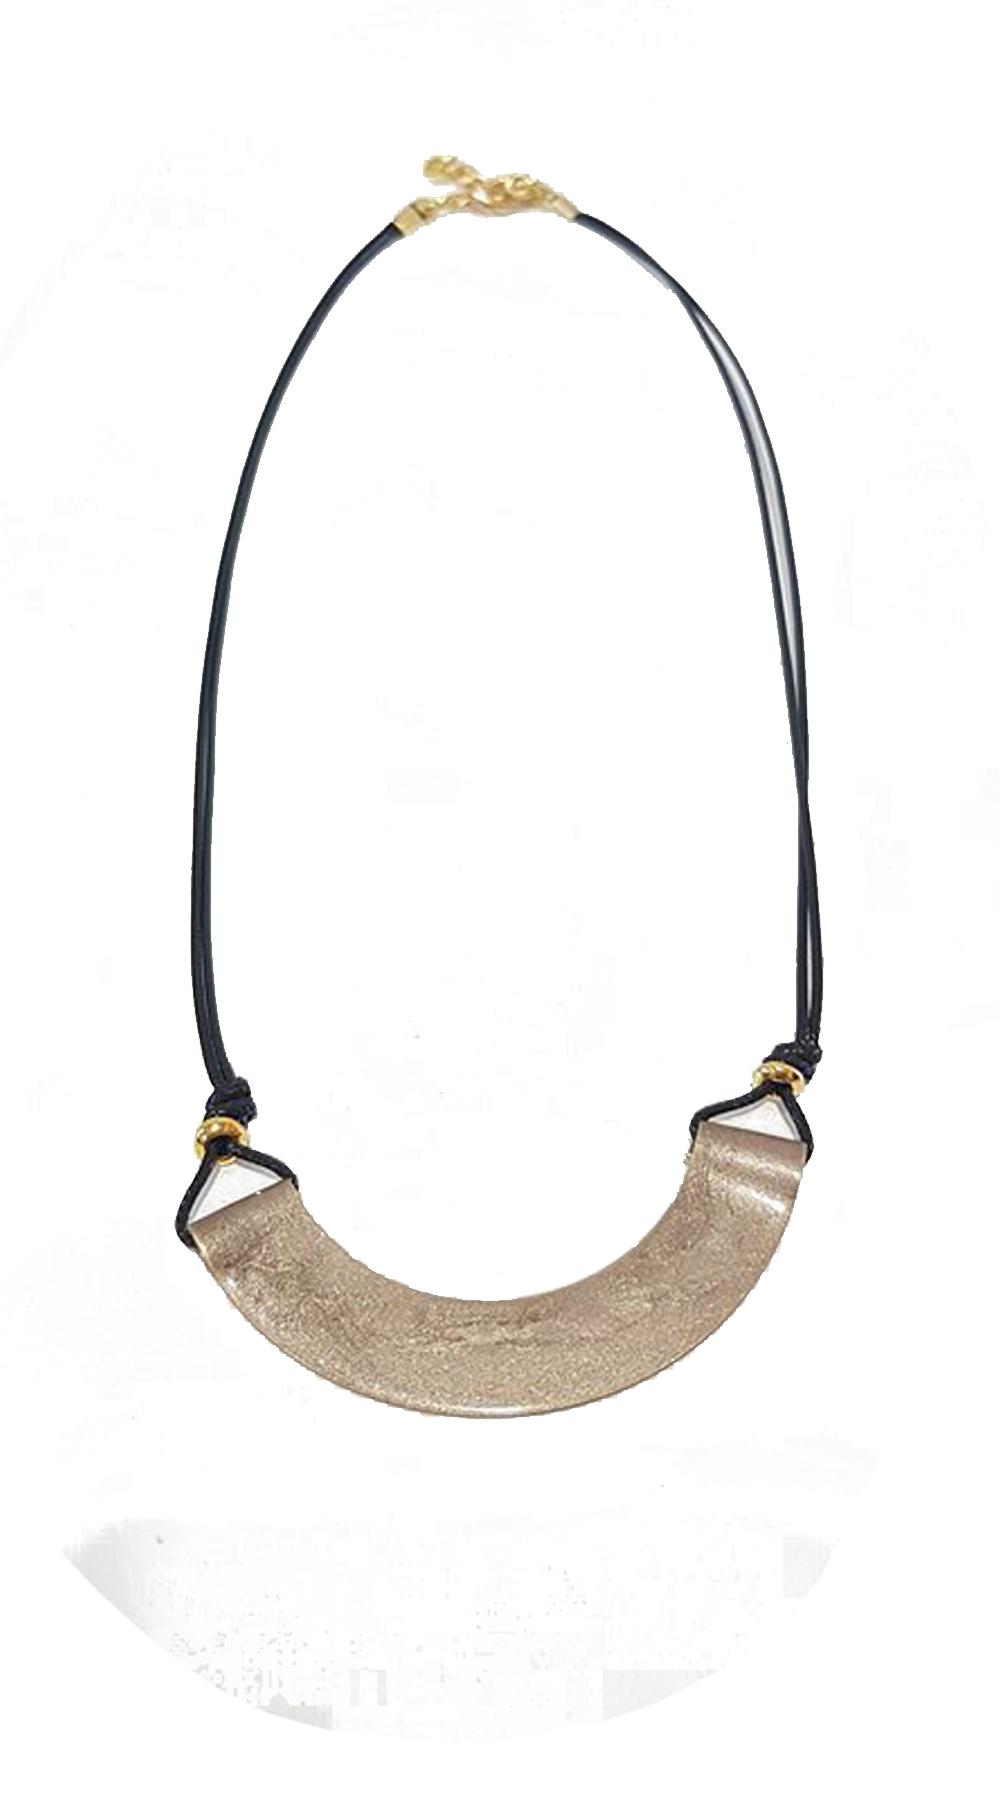 Handmade minimal κολιέ smile - OEM - FA17AC-6995c1 κοσμήματα κολιέ